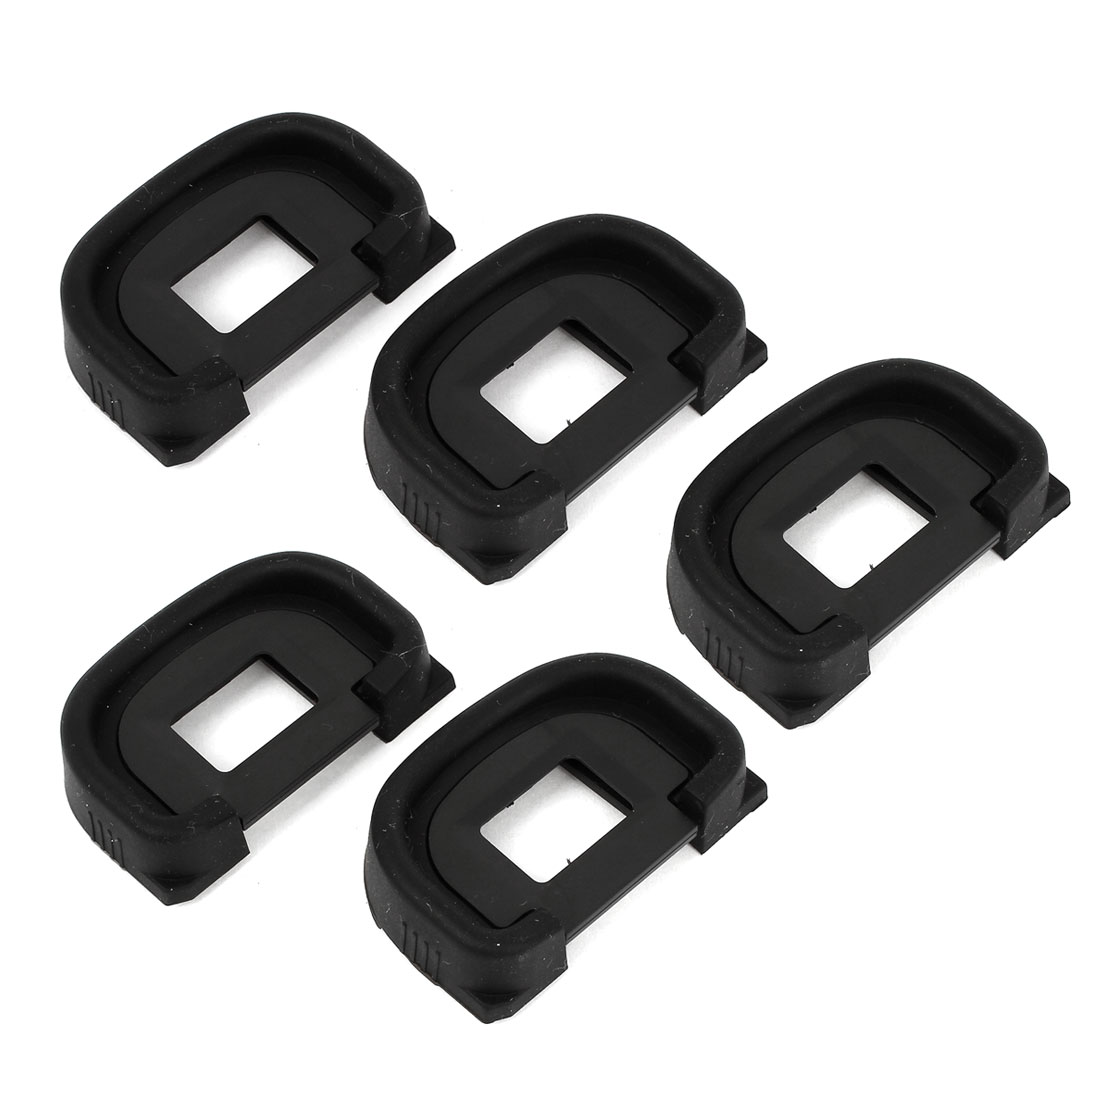 5pcs Black Eyepiece Eye Cup Eyecup EC for Canon EOS 1Ds Mark II 1D 1Ds DSLR